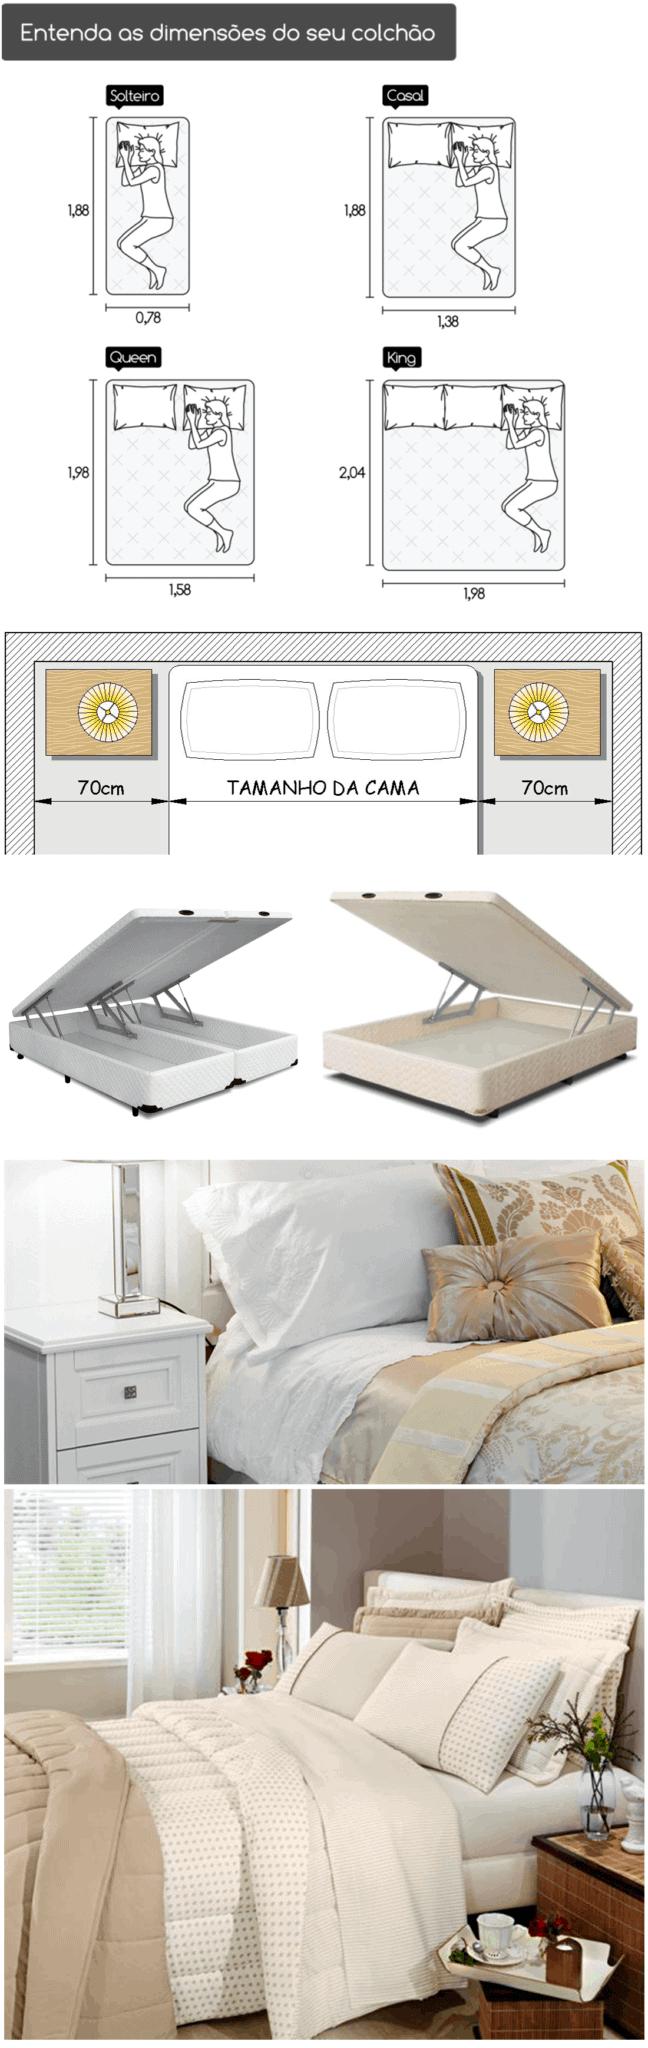 cama-de-casal-decor